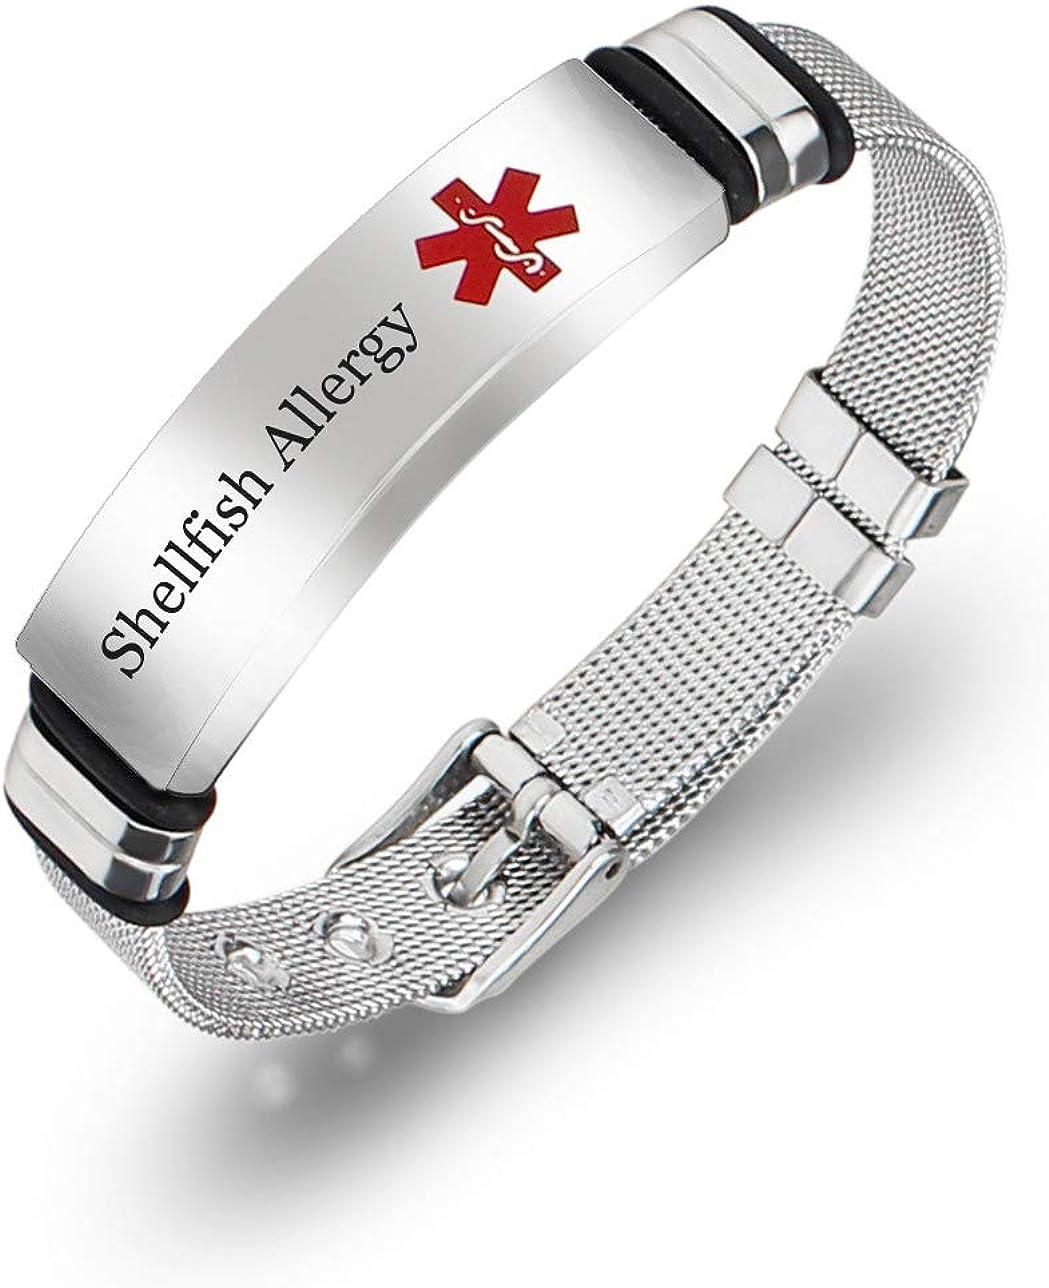 Murinsar Free Customized Surgical Steel Medical Alert Allergy Awareness Bracelet Adjustable ID Bangle for Emergency Aid